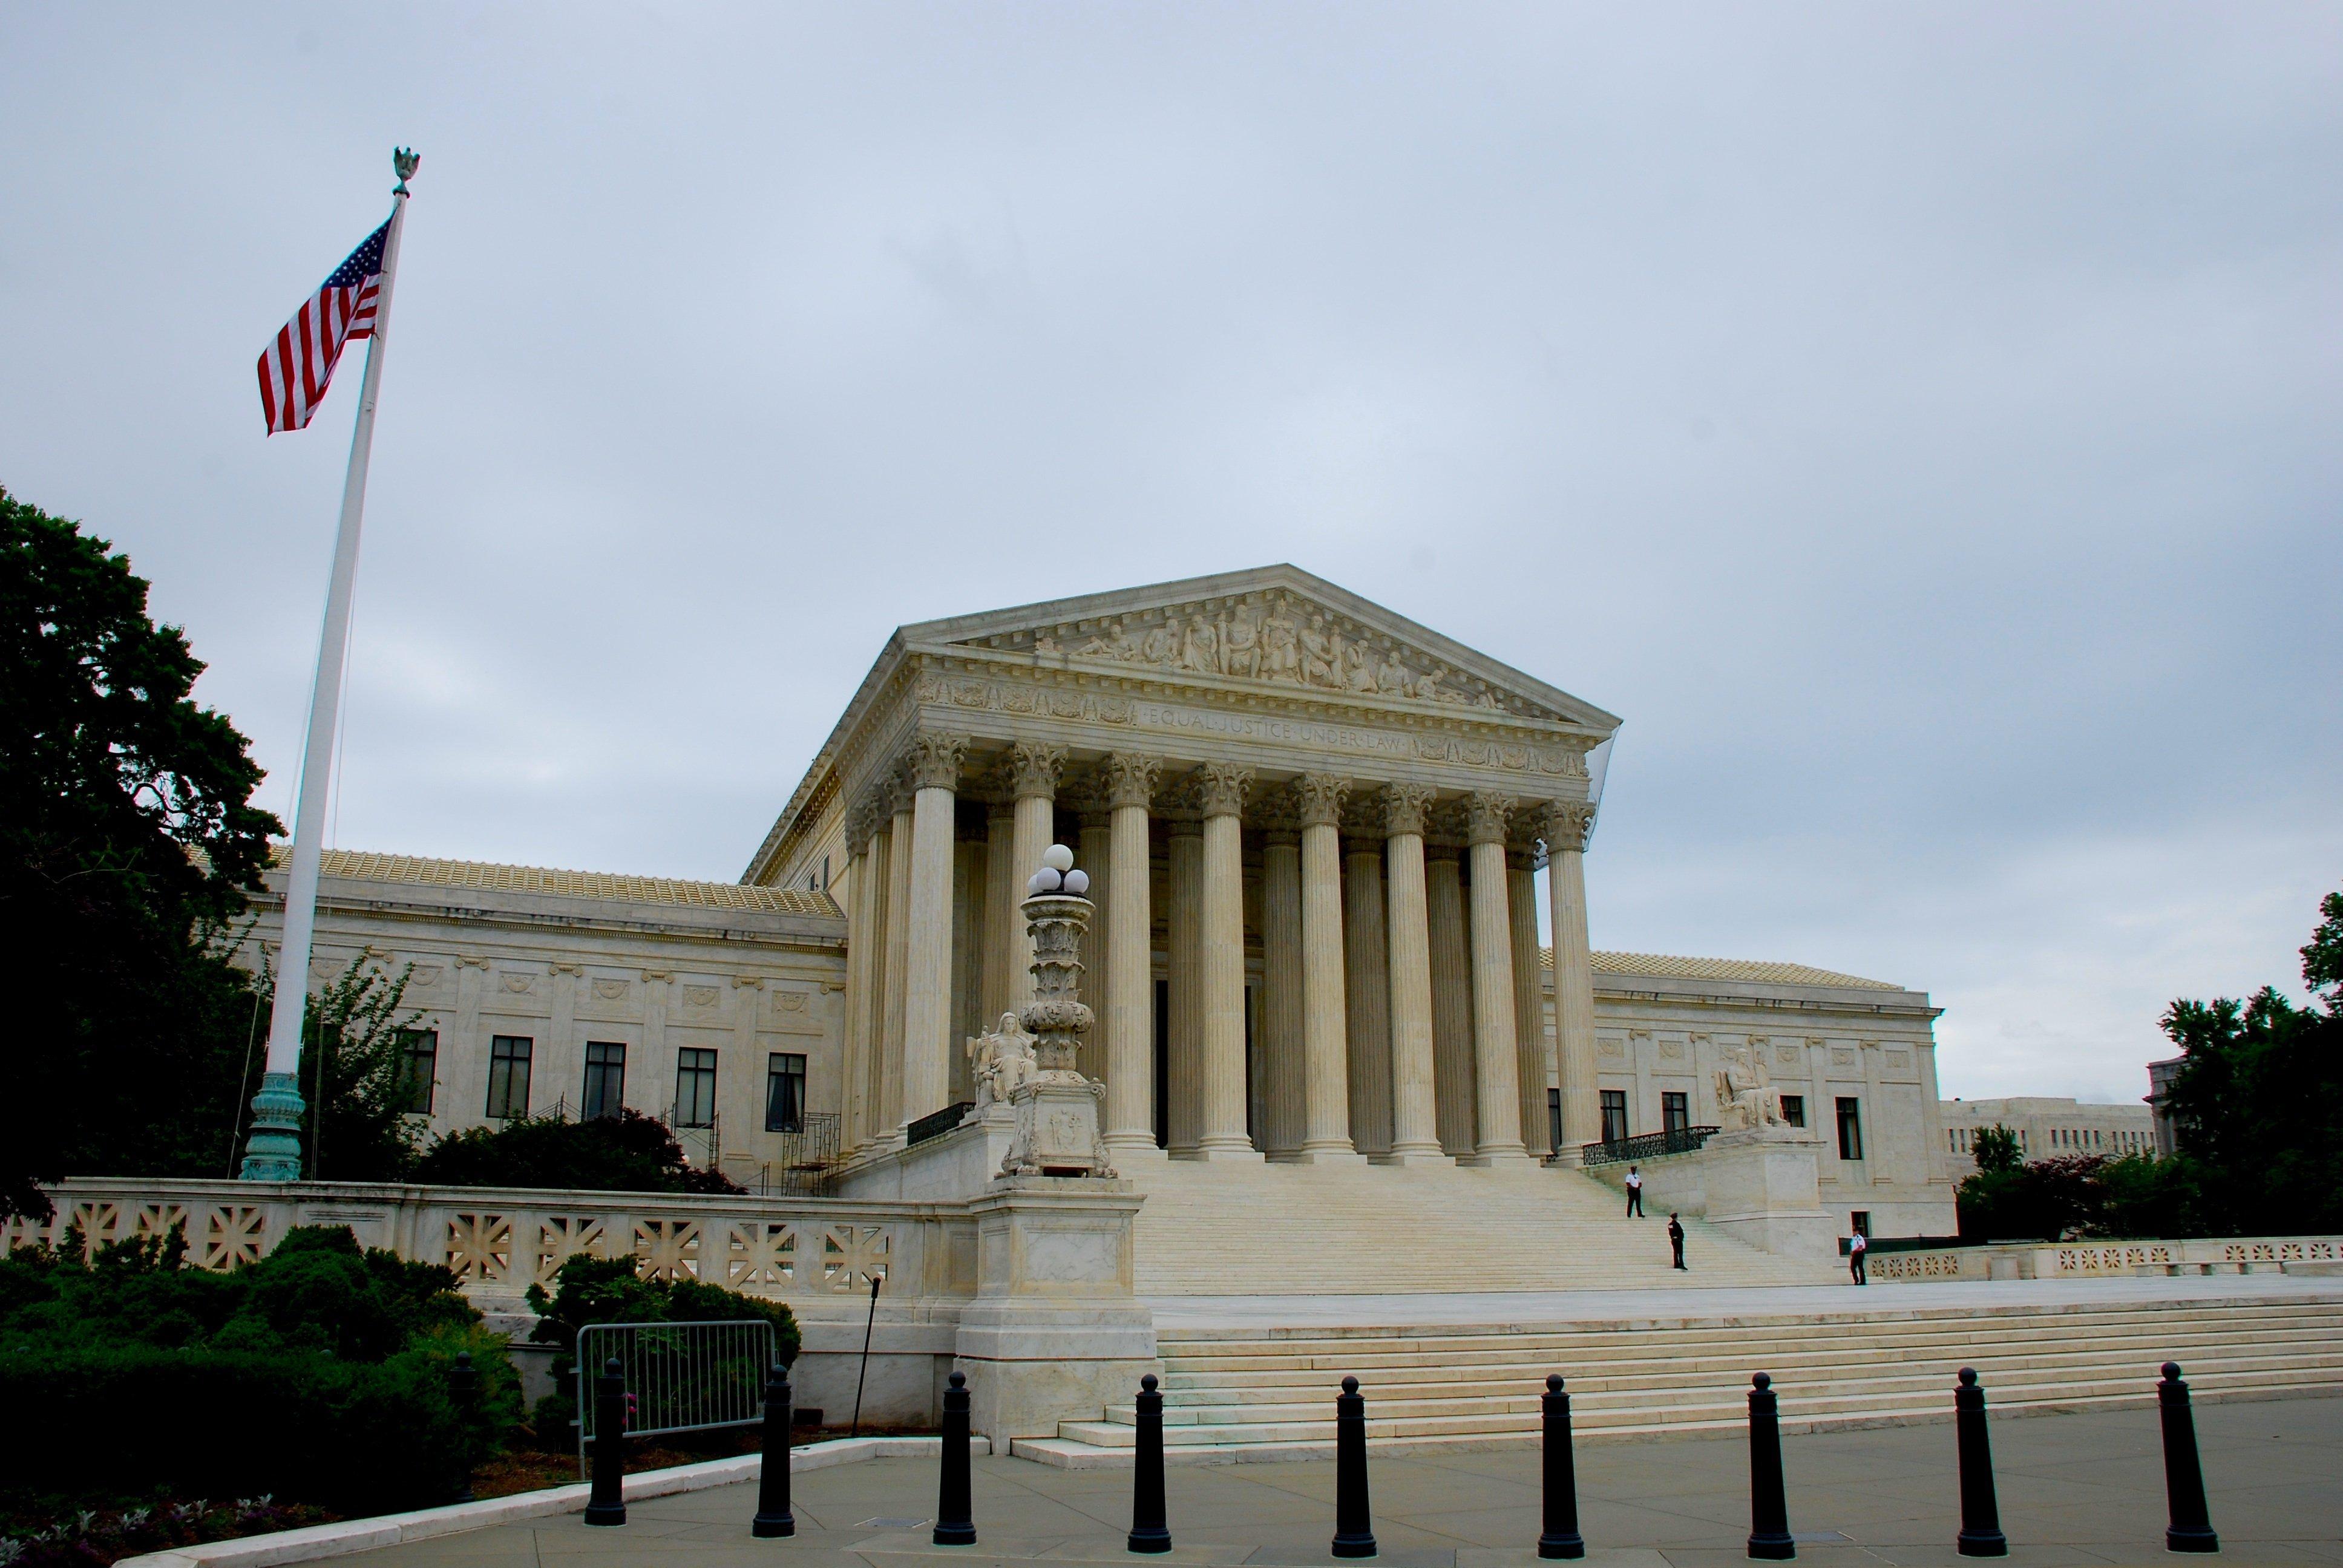 The U.S. Supreme Court in Washington, DC. (photo credit: Chris Turner/CNN)